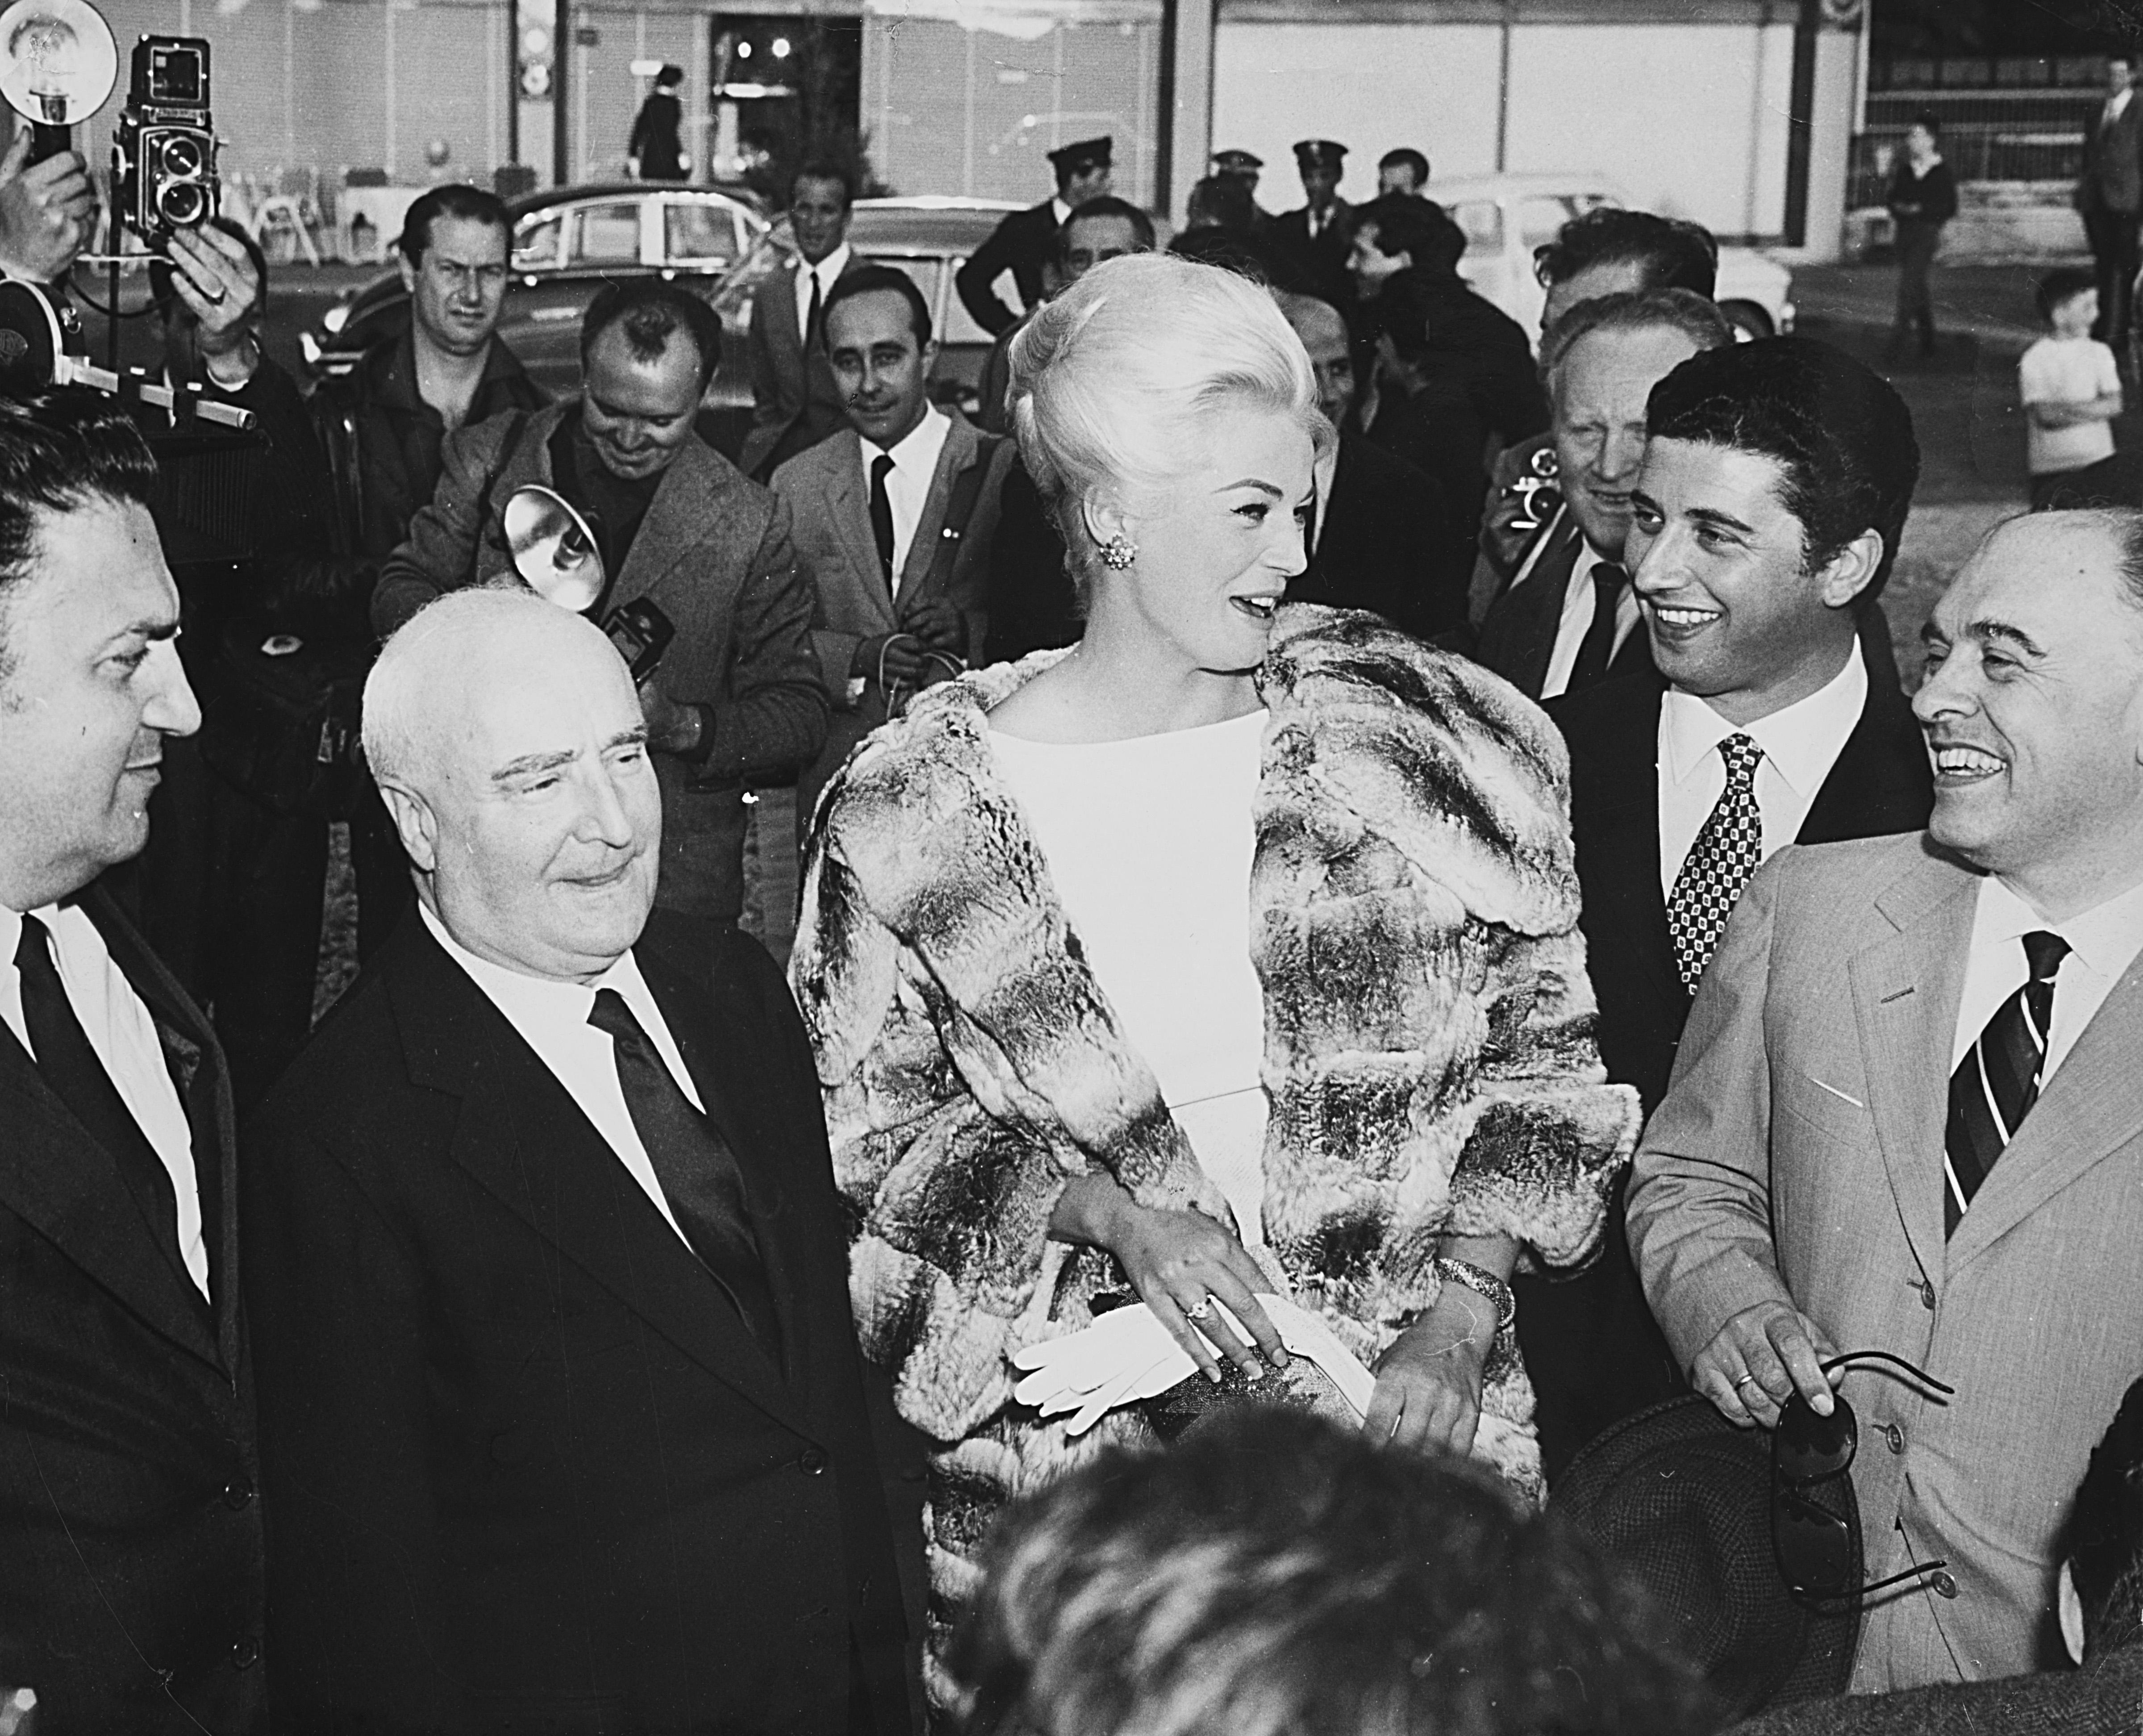 1960. Анита Экберг, Федерико Феллини, Карло Понти и Риццоли